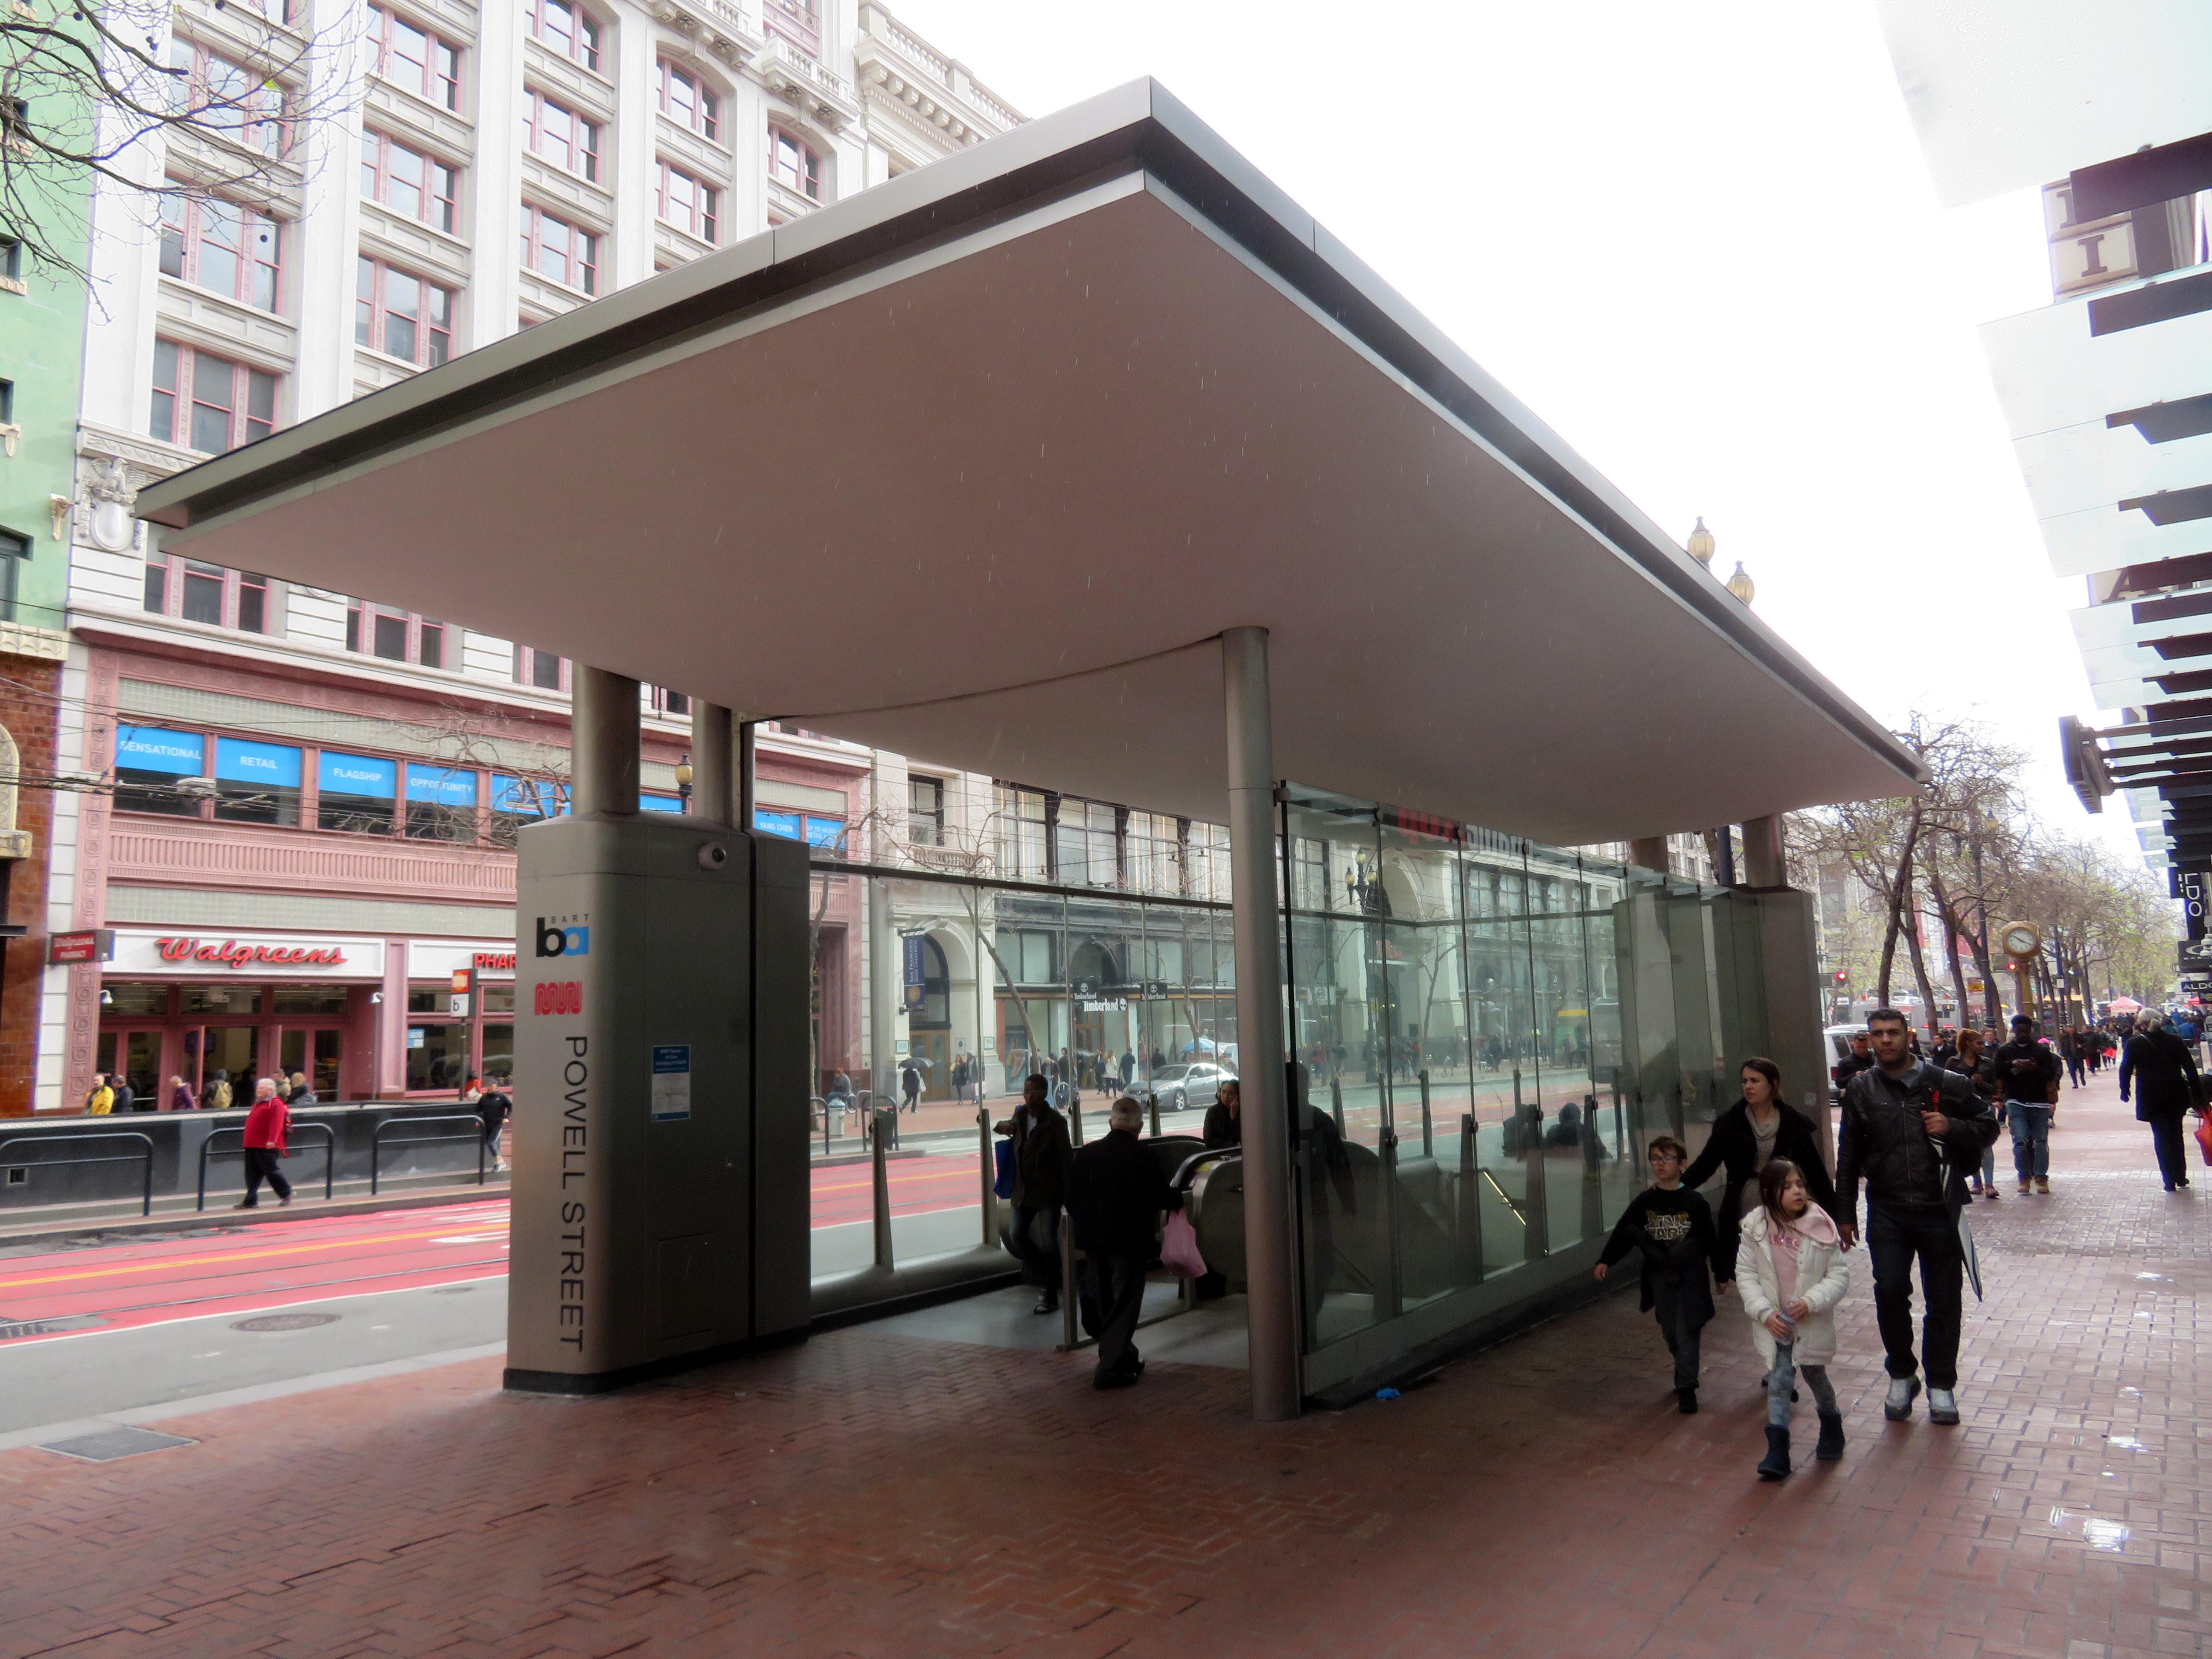 FileNew canopy at Powell Street station March 2019.JPG & File:New canopy at Powell Street station March 2019.JPG - Wikimedia ...